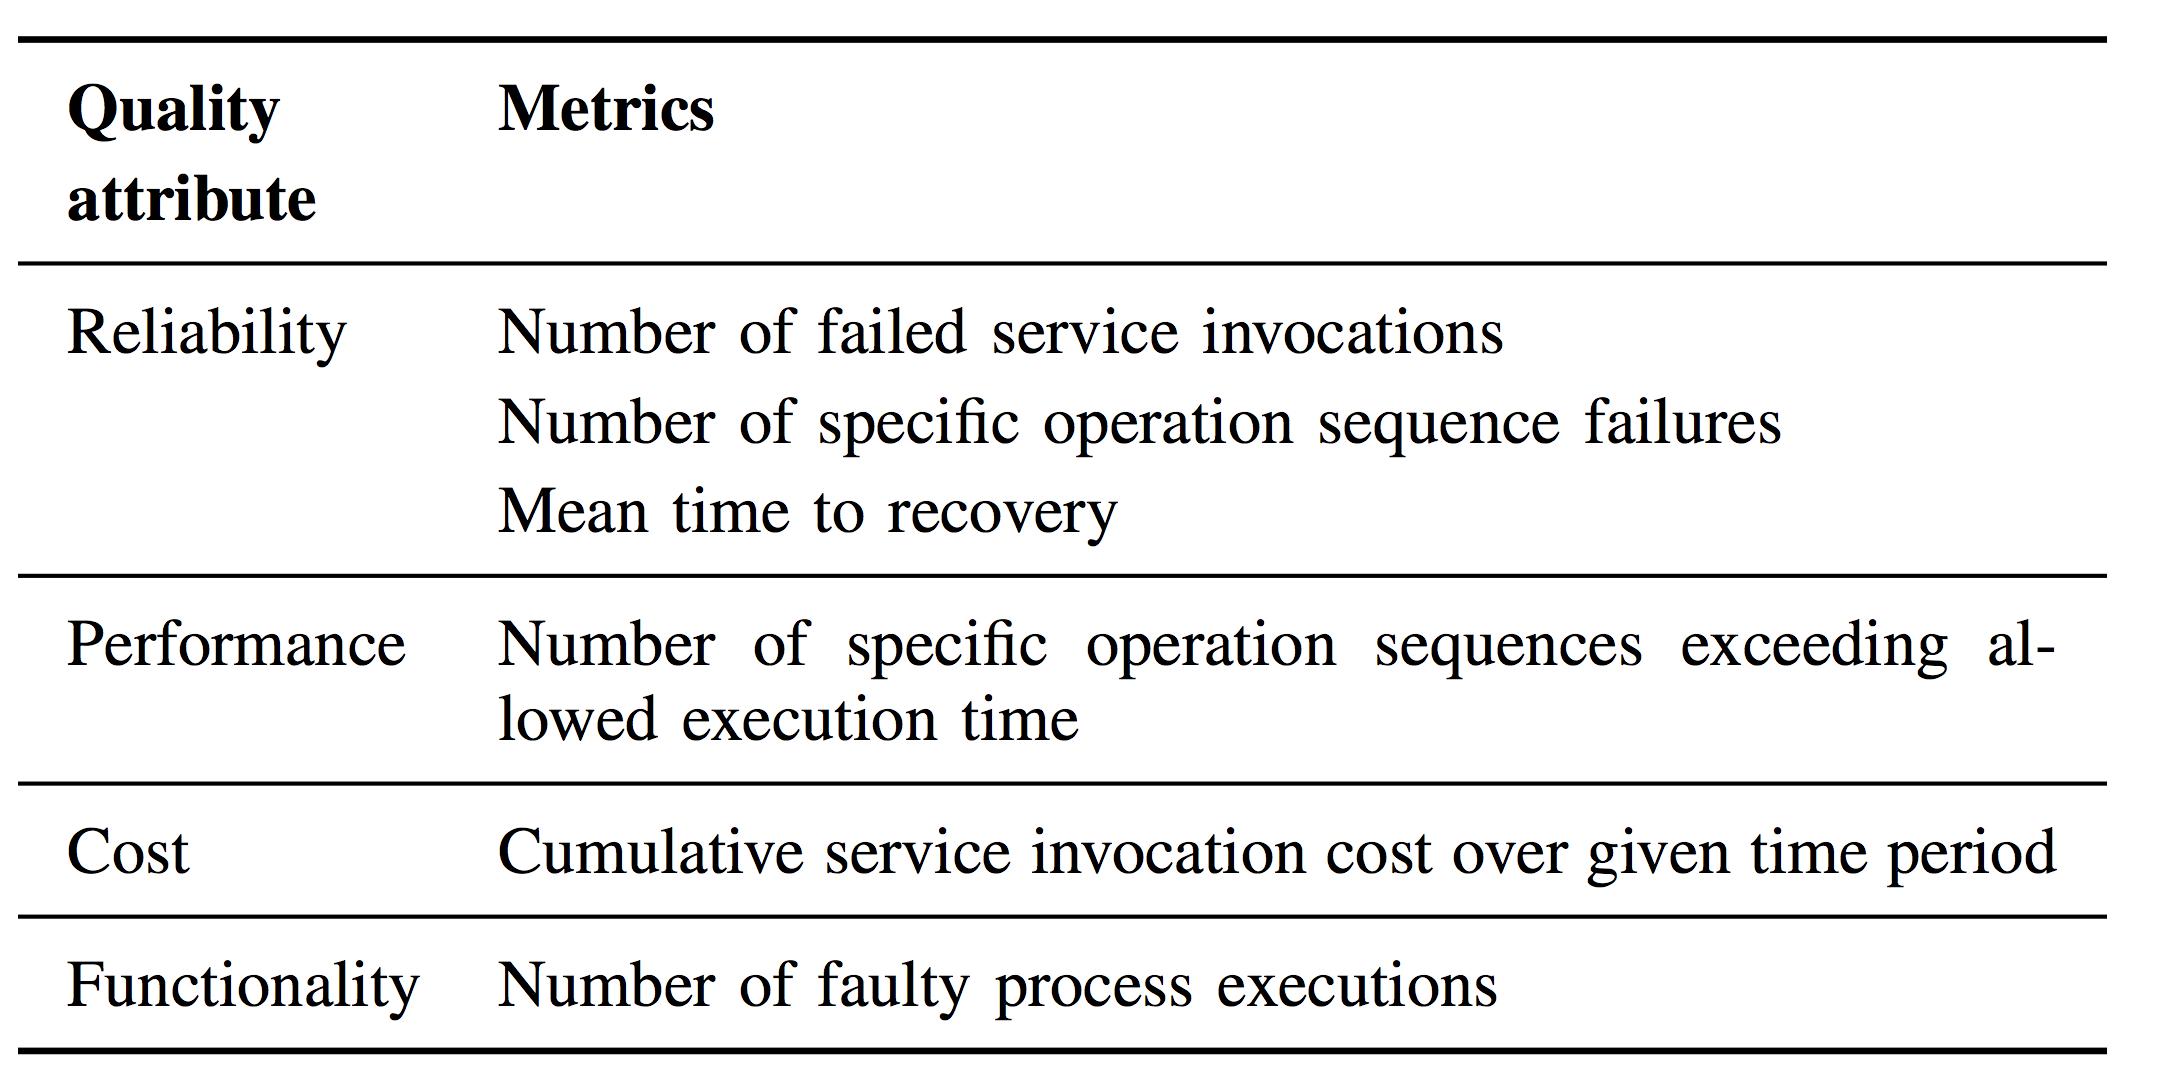 tas-metrics